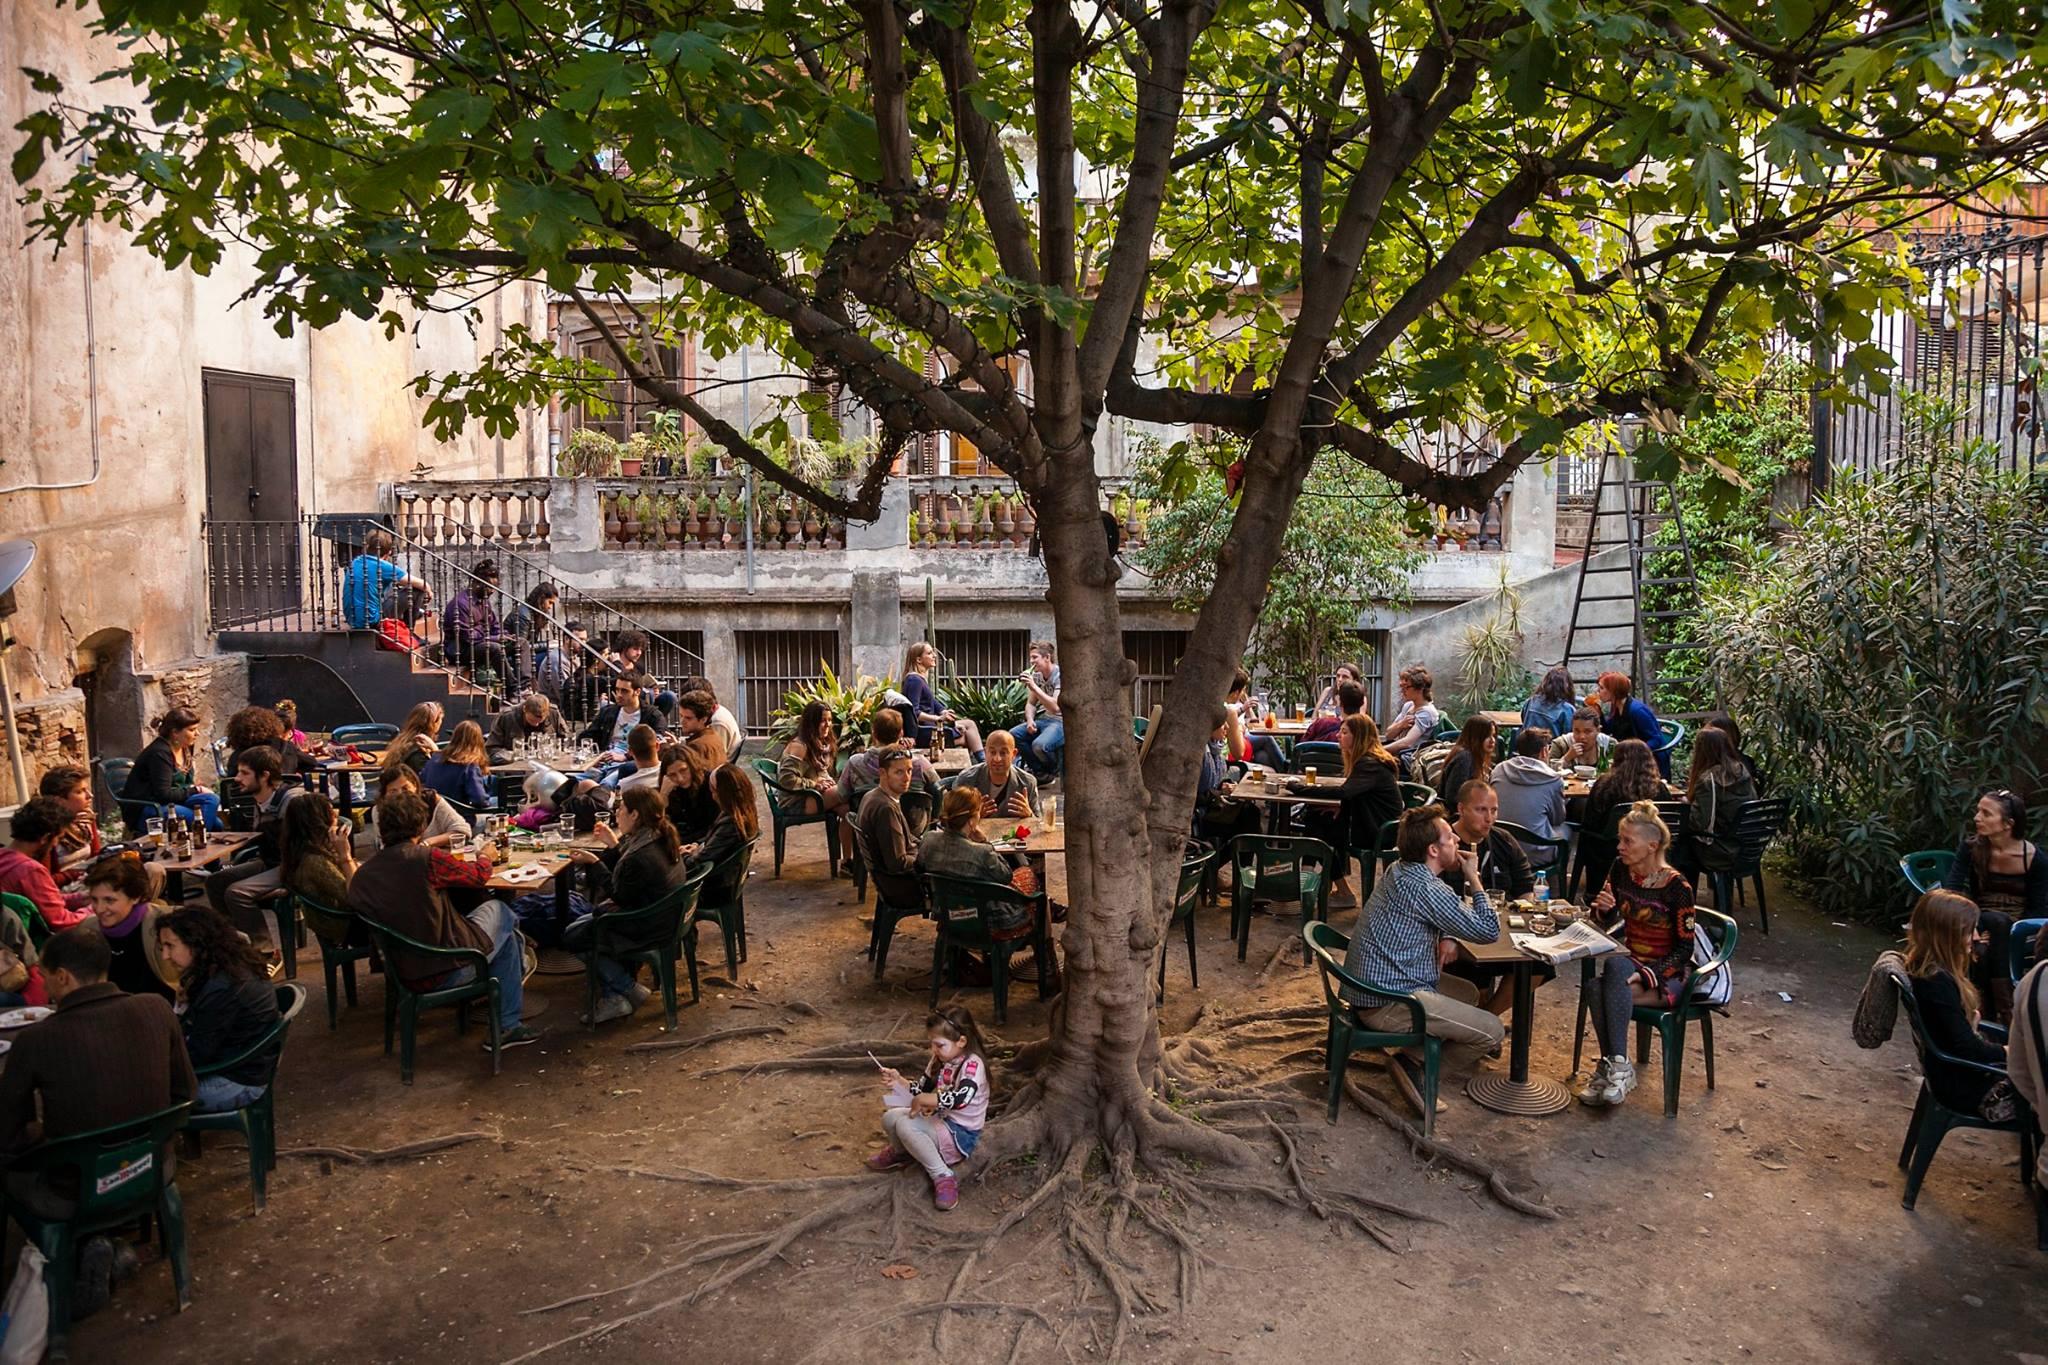 Las 10 terrazas ms bonitas de Espaa LOVELY STREETS